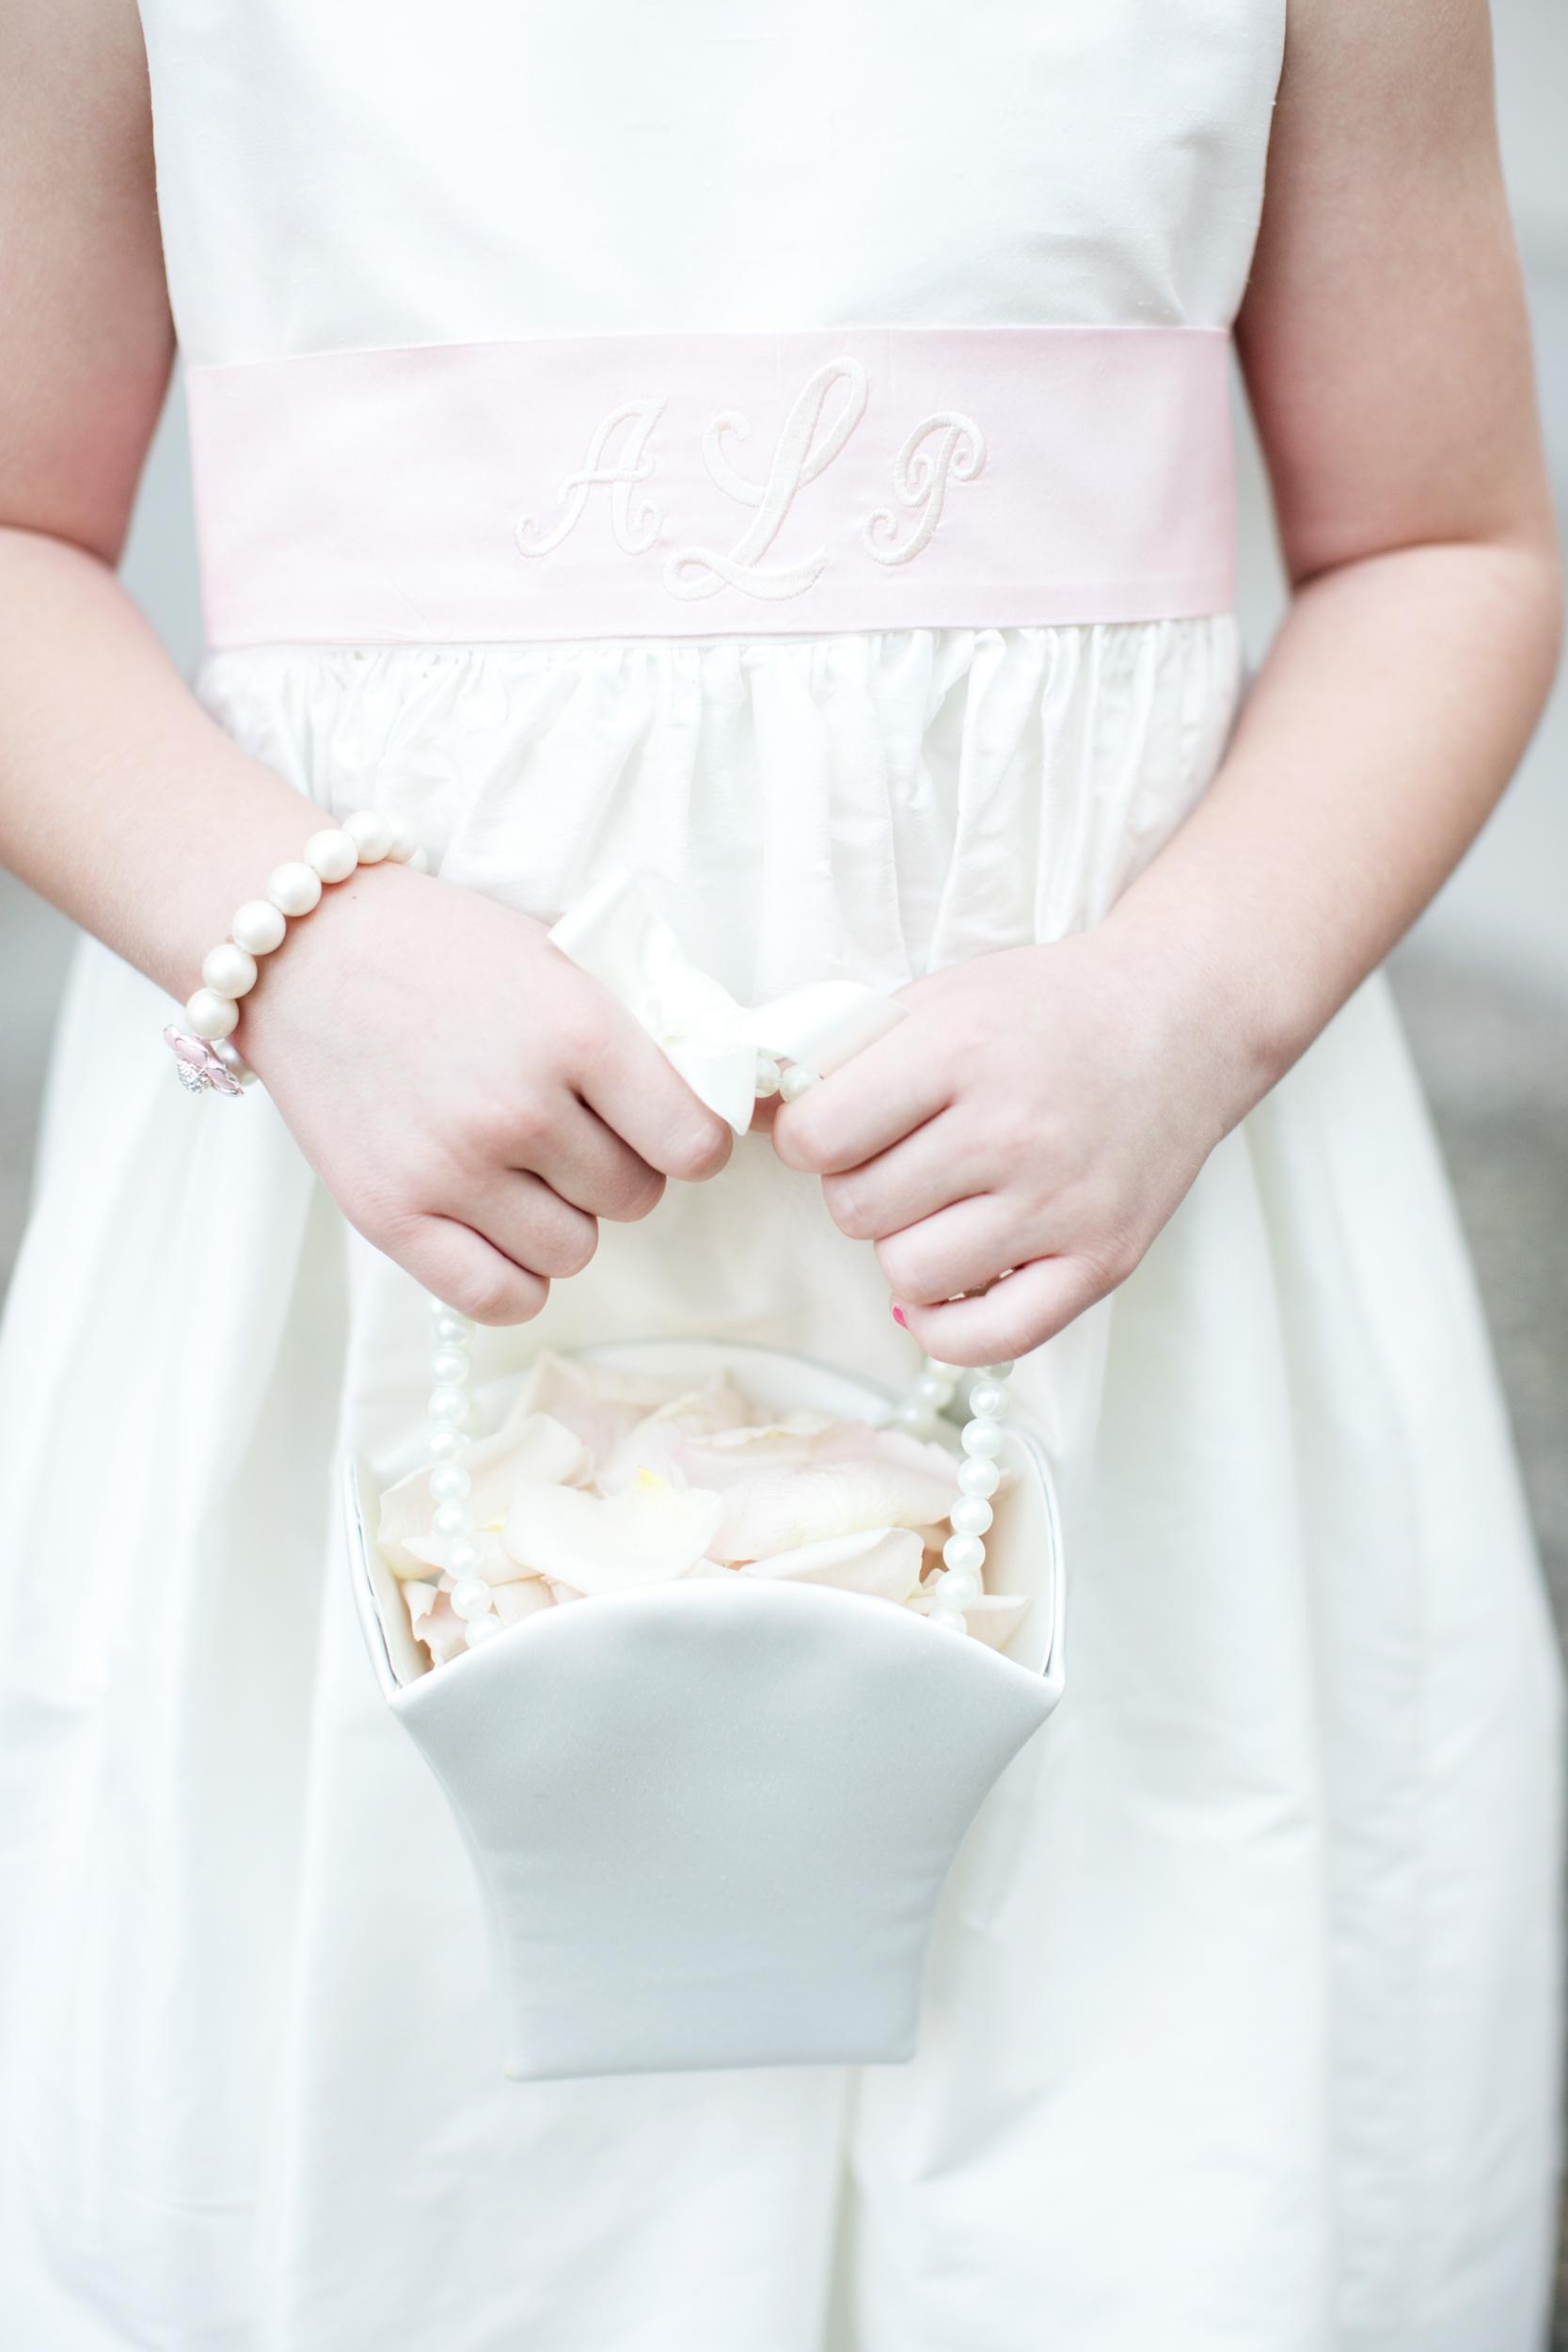 Ceci_New_York_Ceci_Style_Ceci_Johnson_Luxury_Lifestyle_Floral_Lace_Wedding_Letterpress_Inspiration_Design_Custom_Couture_Personalized_Invitations_-70.jpg